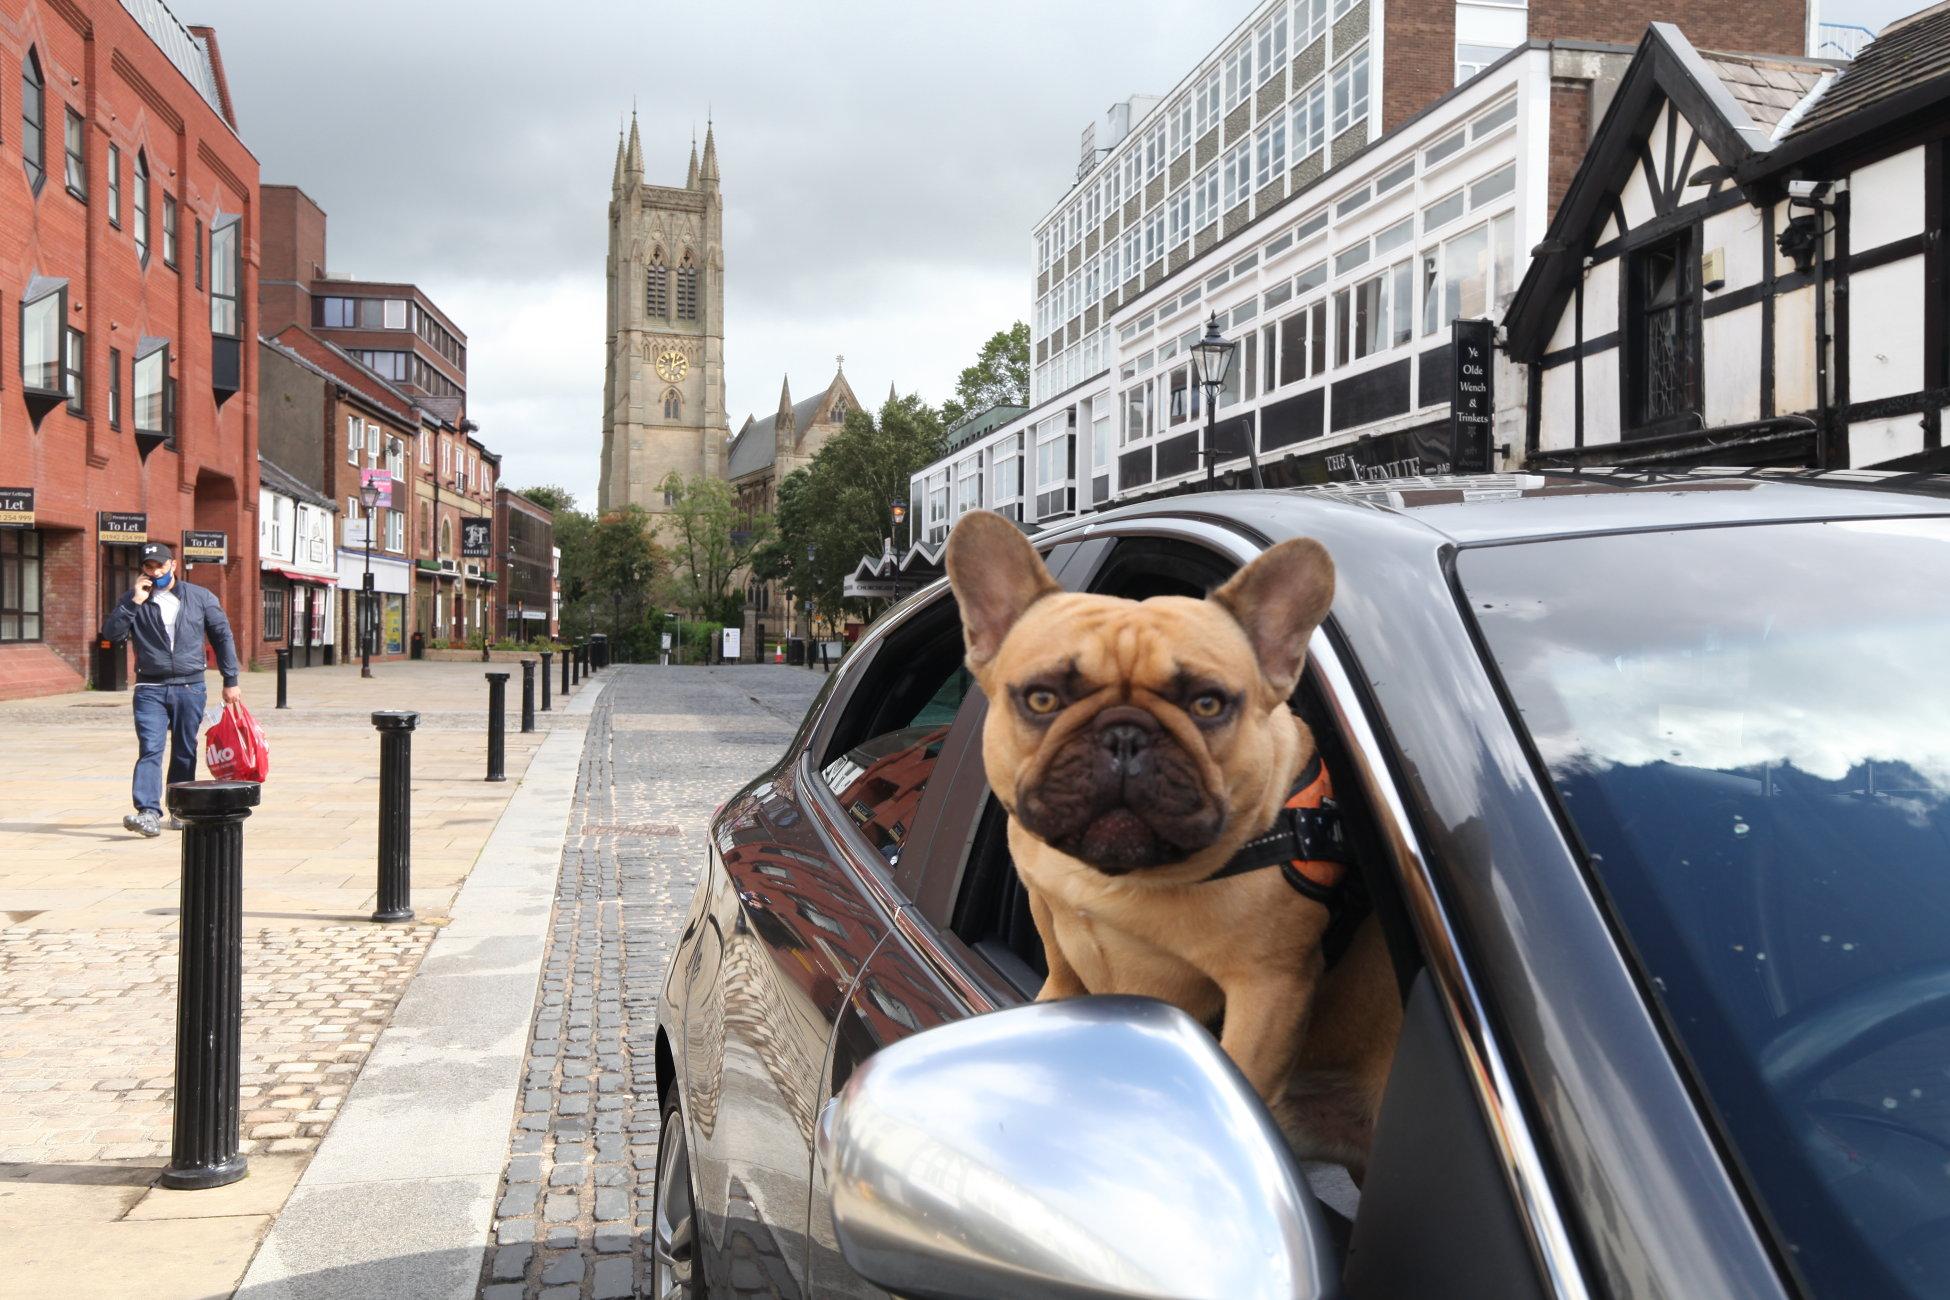 Dog in Bolton in the middle of Coronavirus lockdown